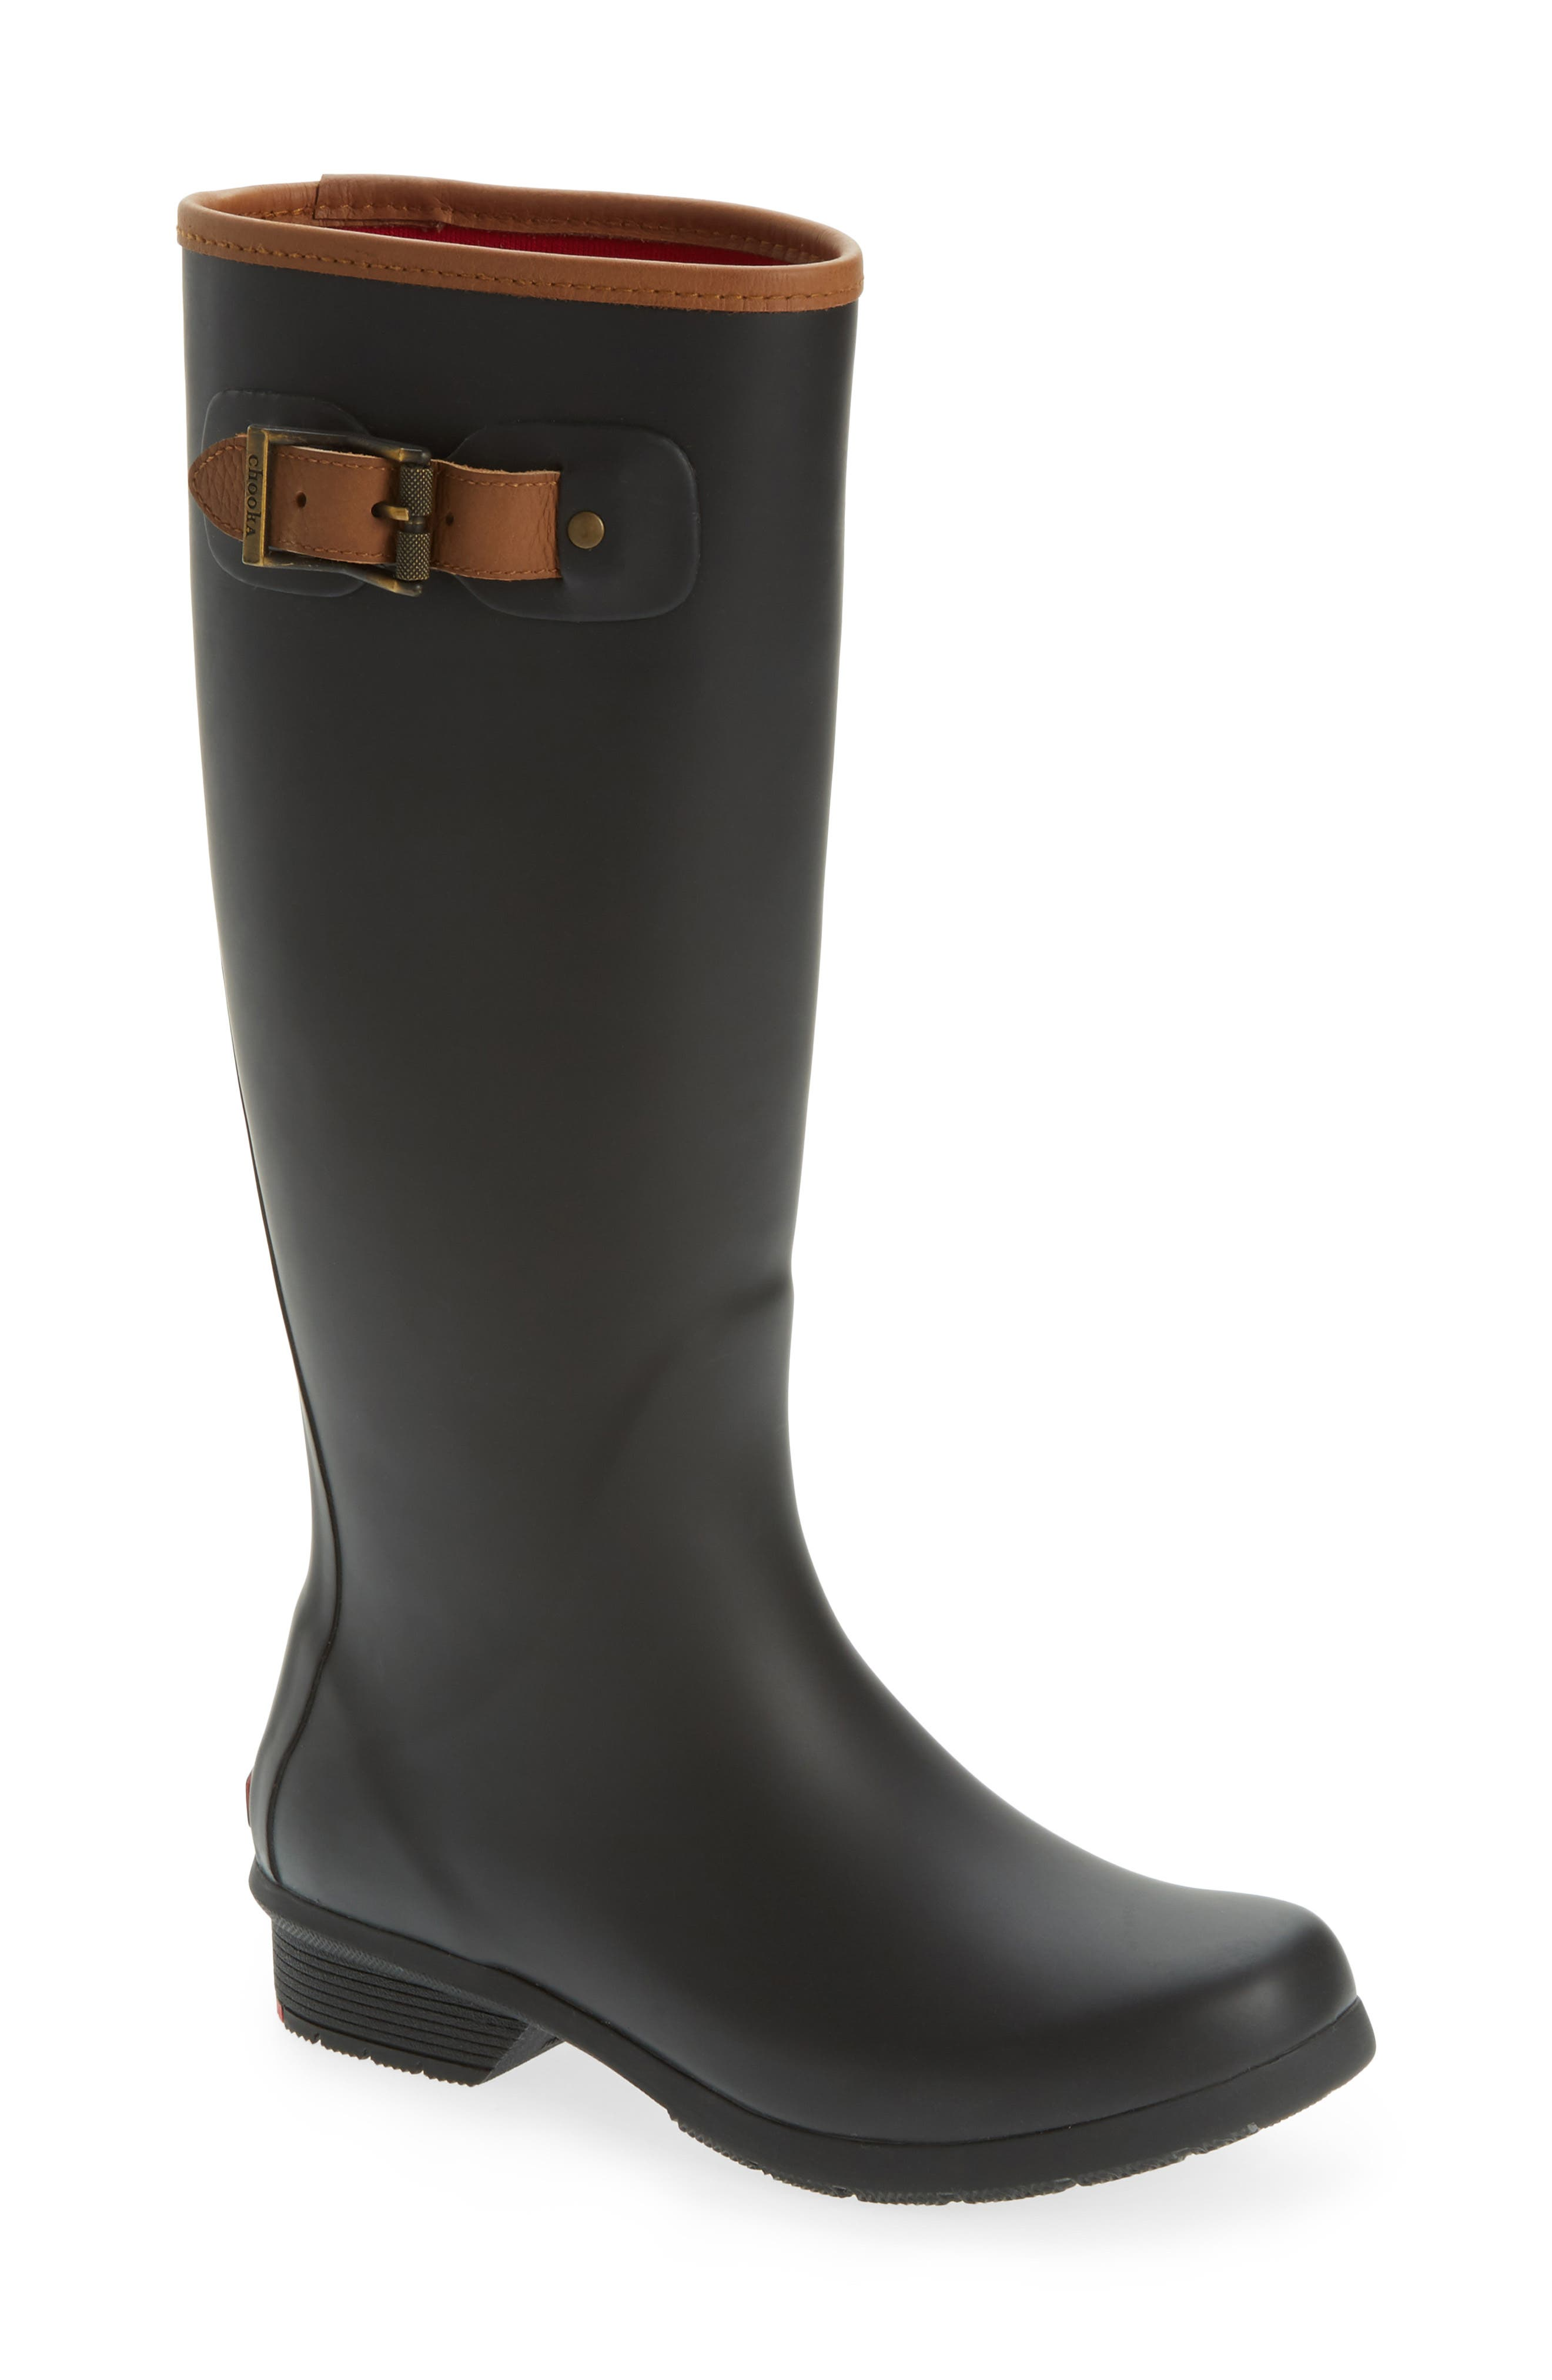 Alternate Image 1 Selected - Chooka City Tall Rain Boot (Women)